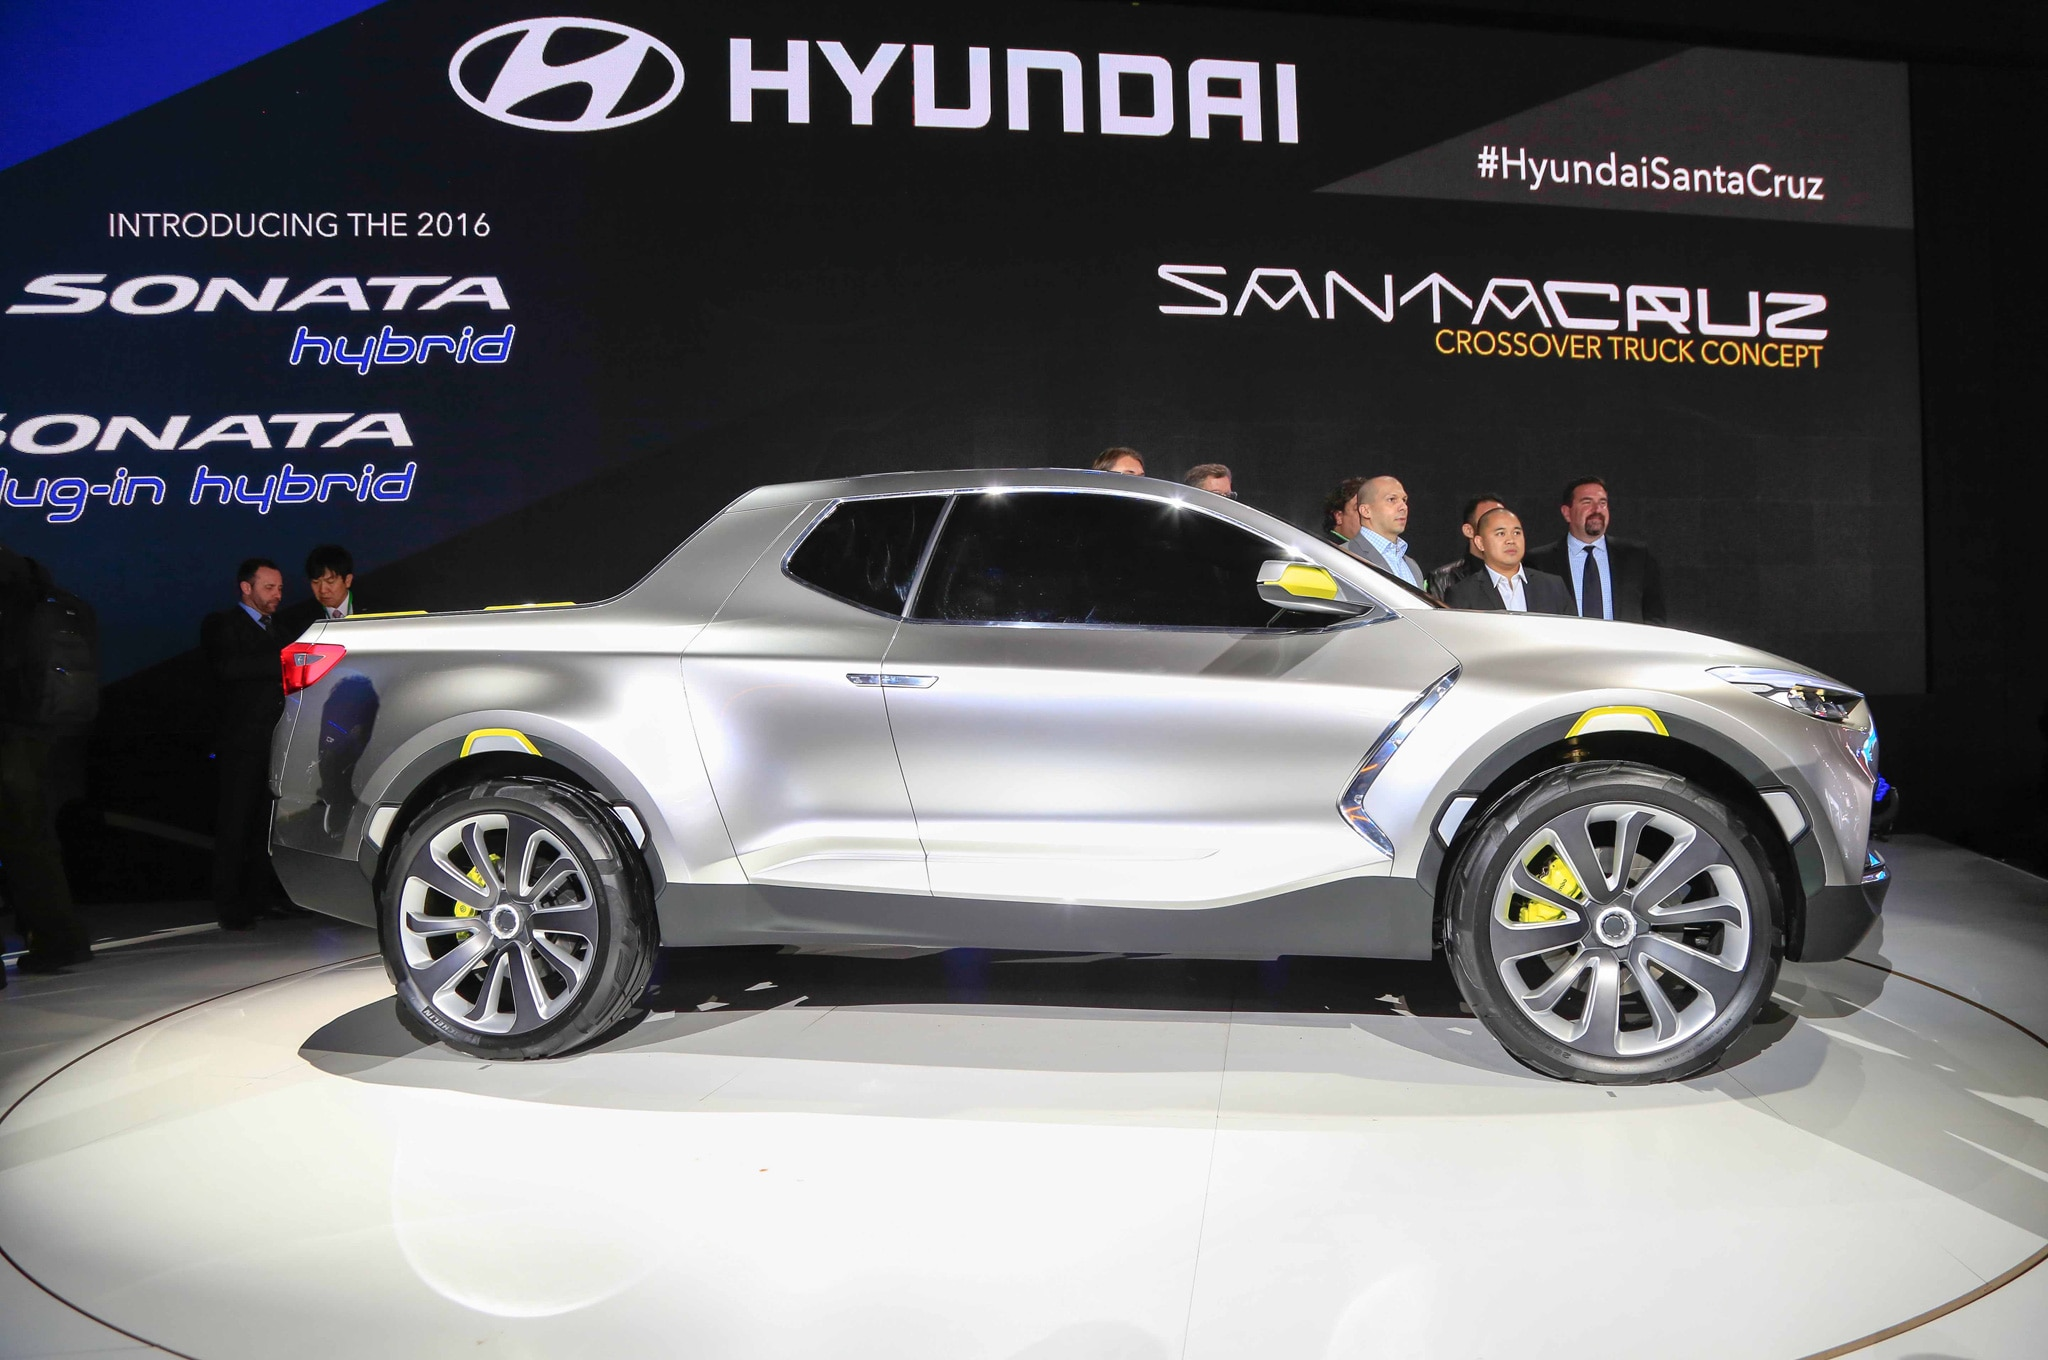 Hyundai Santa Cruz Truck Deemed Too Soft For Australia